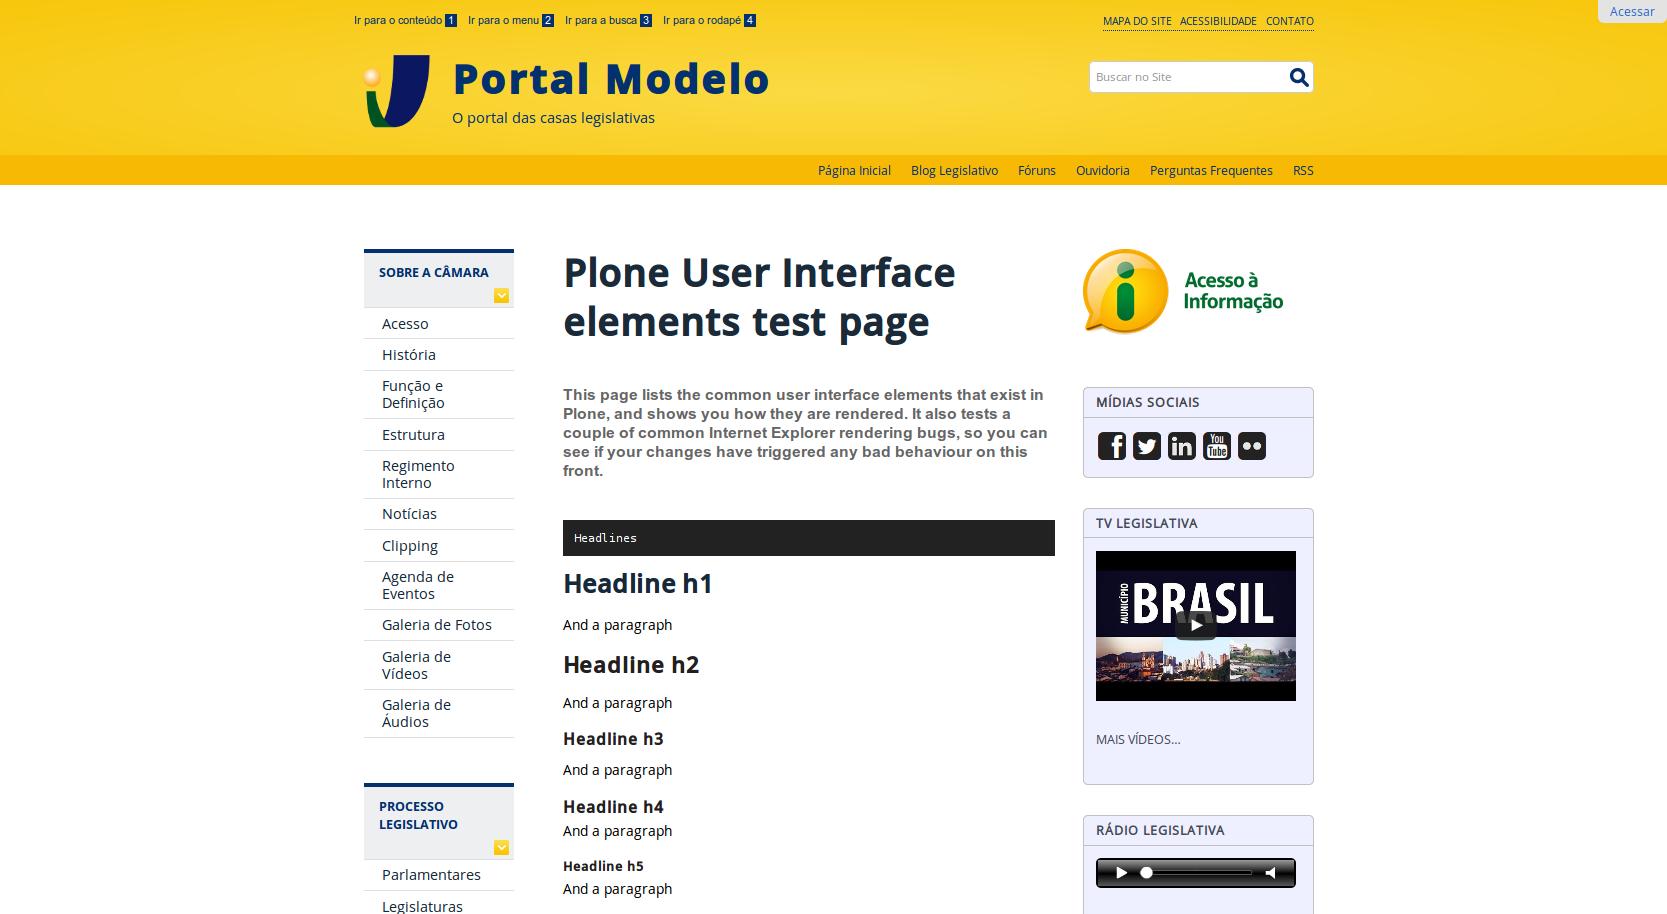 https://raw.githubusercontent.com/interlegis/interlegis.portalmodelo.theme/master/src/interlegis/portalmodelo/theme/themes/IDG-amarelo/preview.png